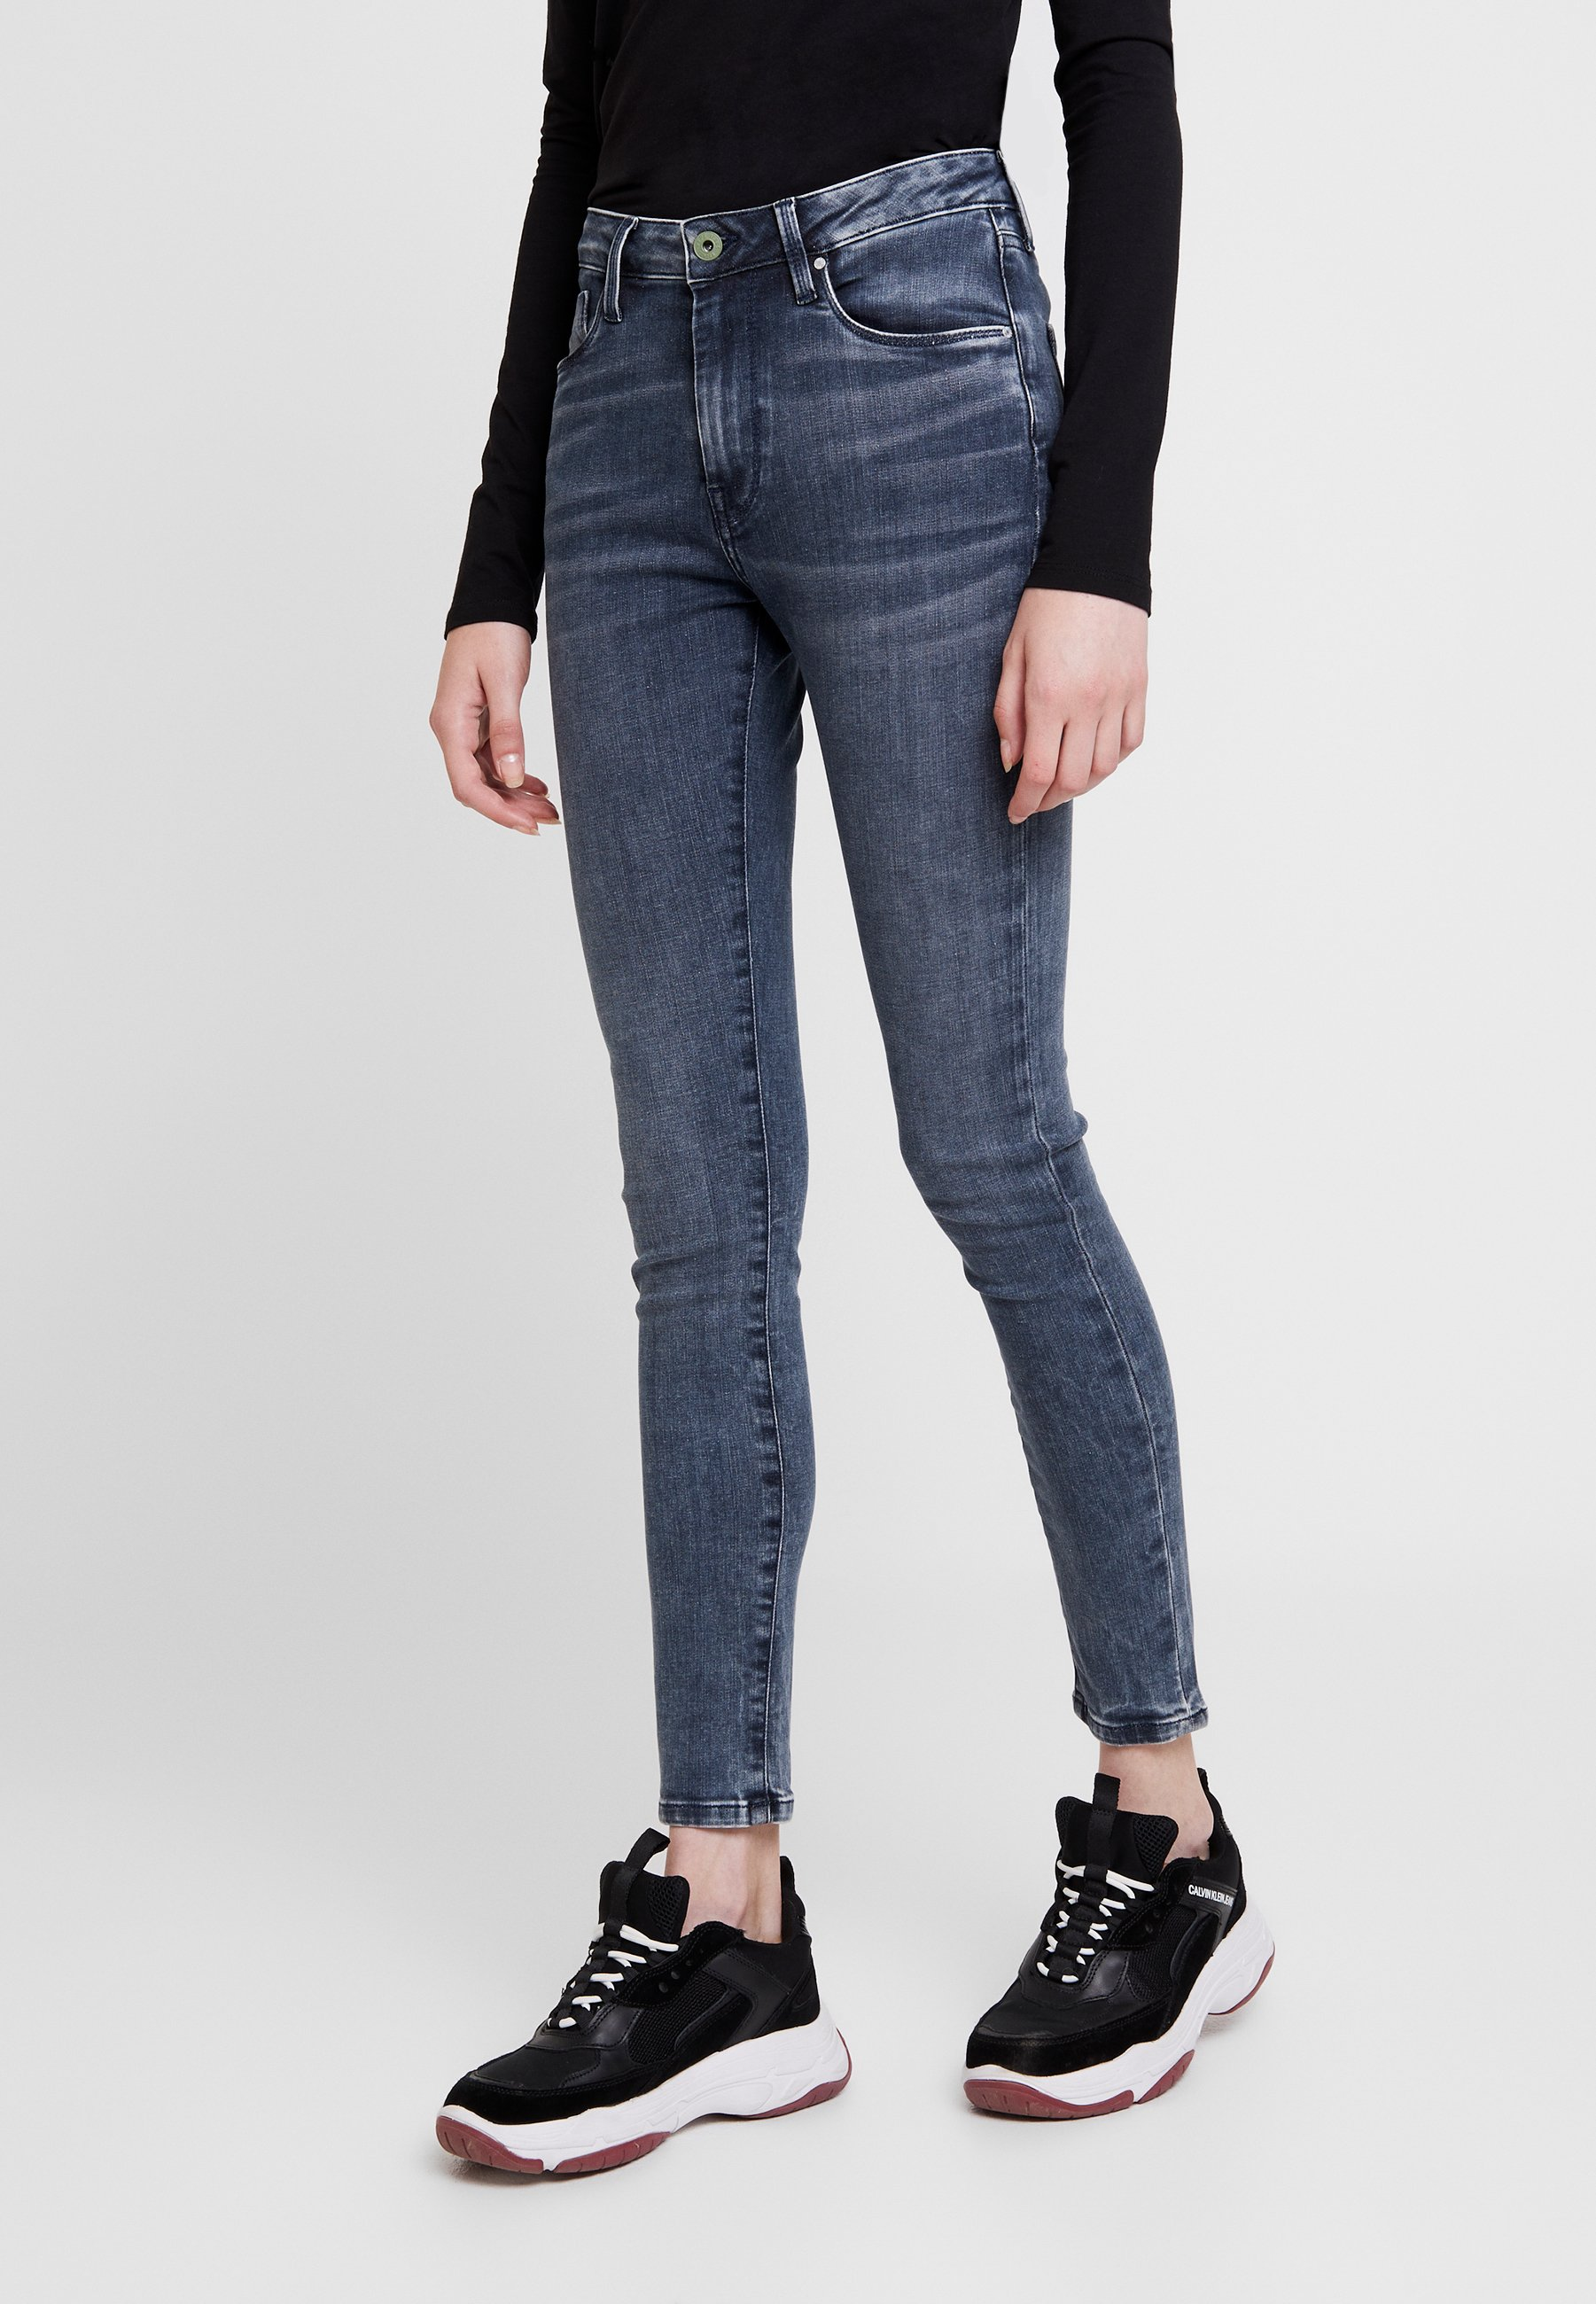 SkinnyDenim Pepe Jeans Pepe Jeans SkinnyDenim Pepe Jeans zVUMqpS